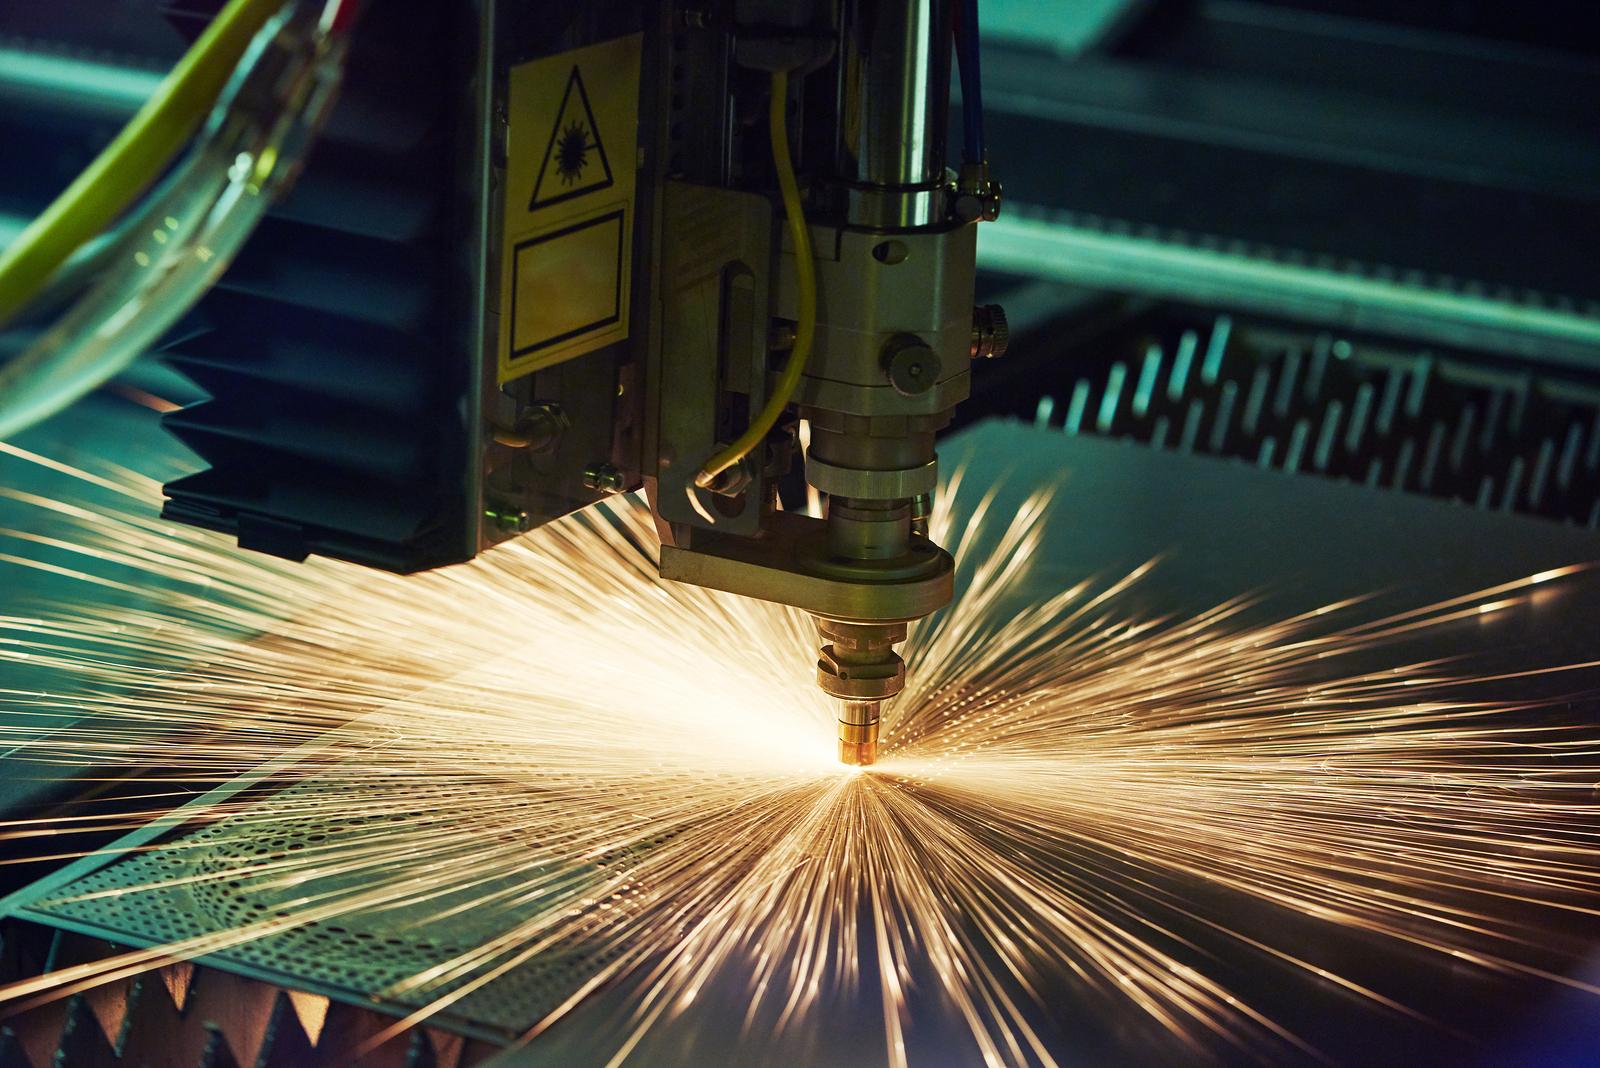 Machine cutting through metal